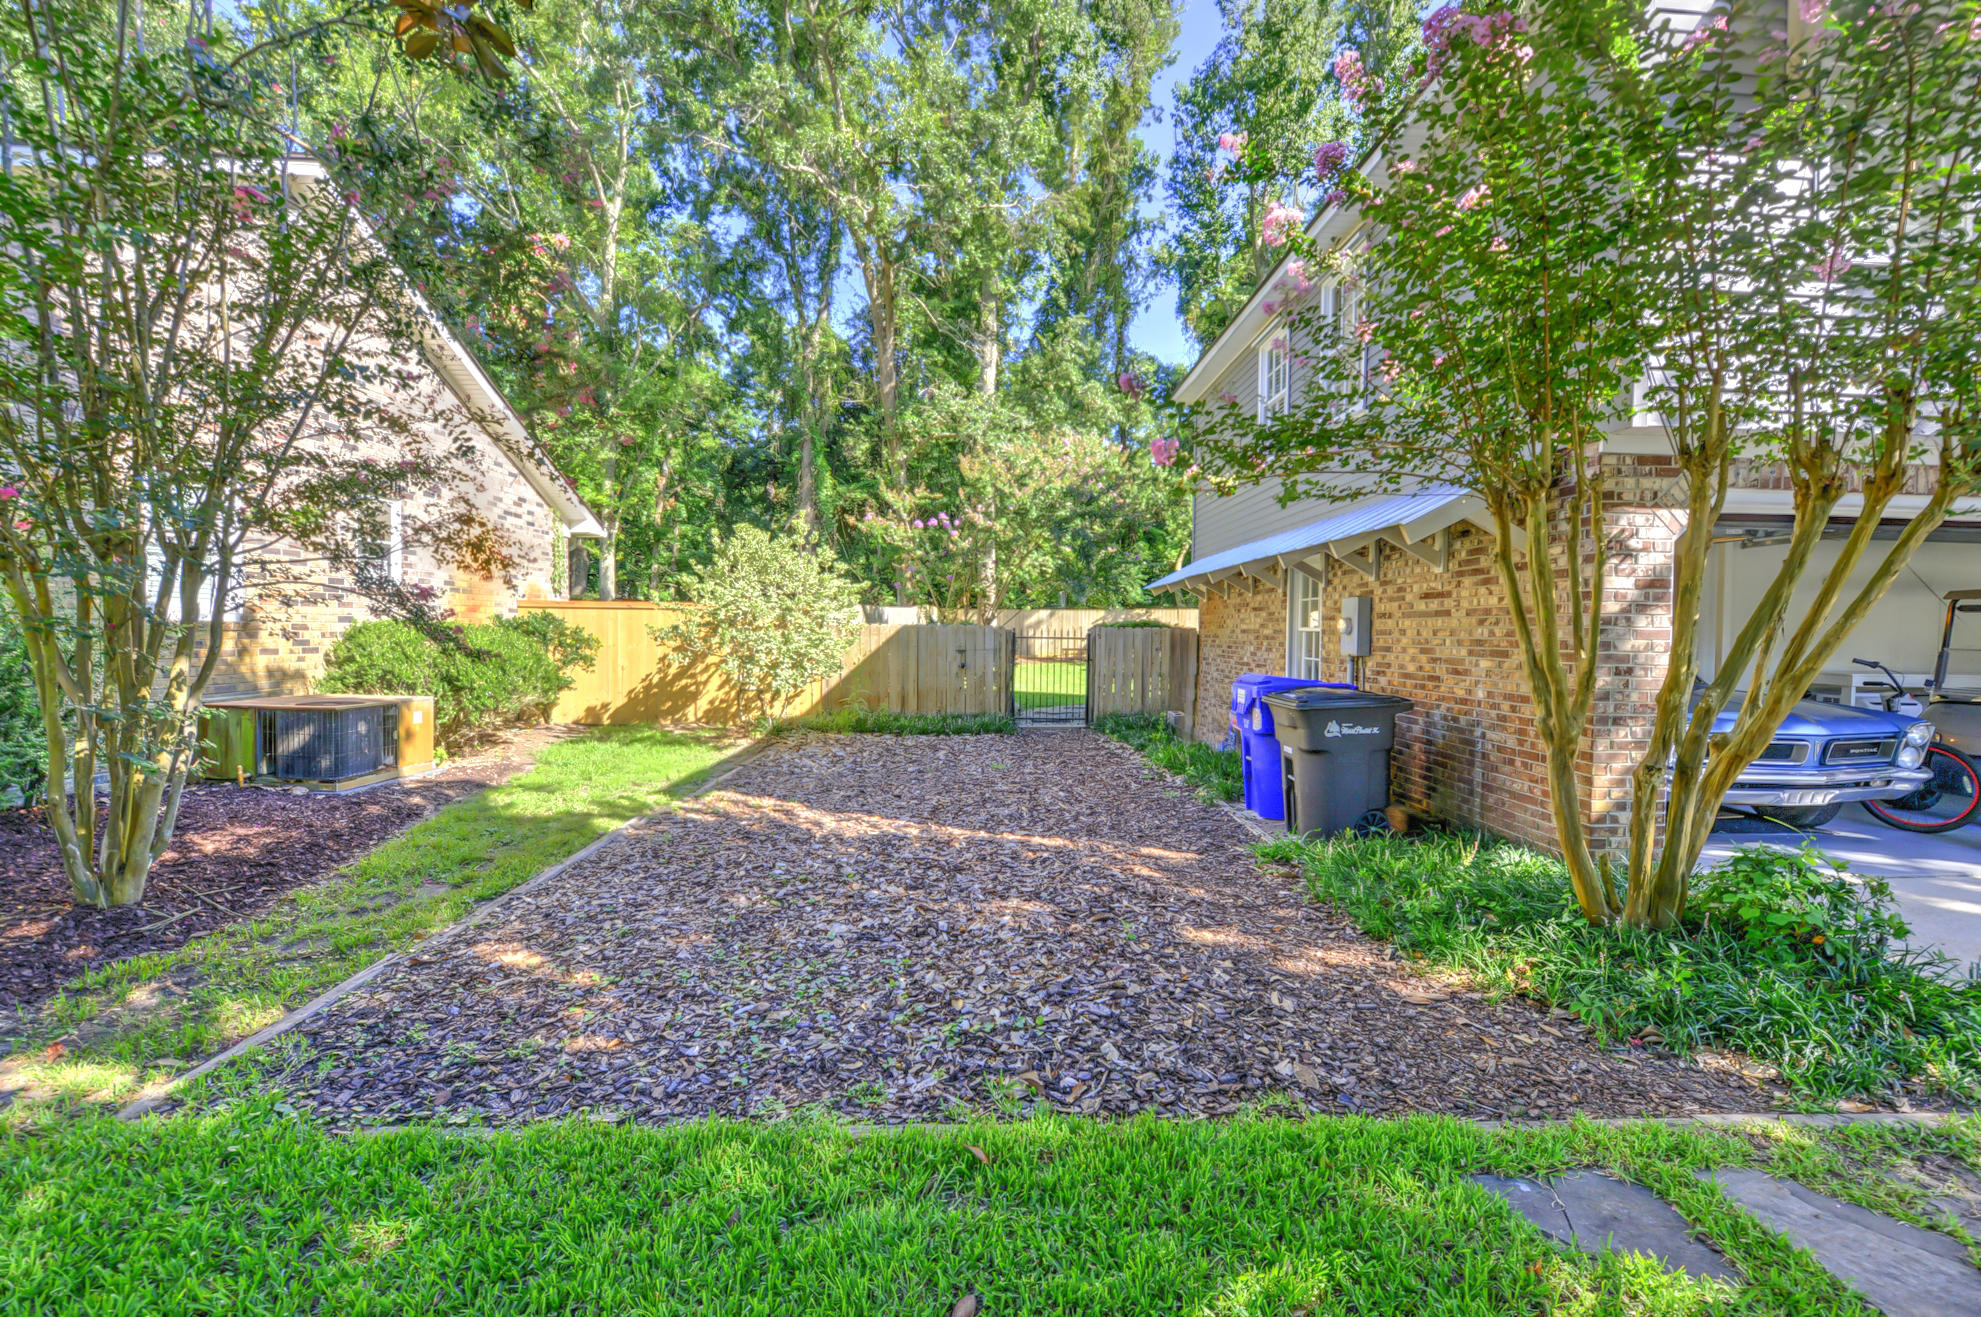 Shemwood II Homes For Sale - 1017 Jack Snipe, Mount Pleasant, SC - 29